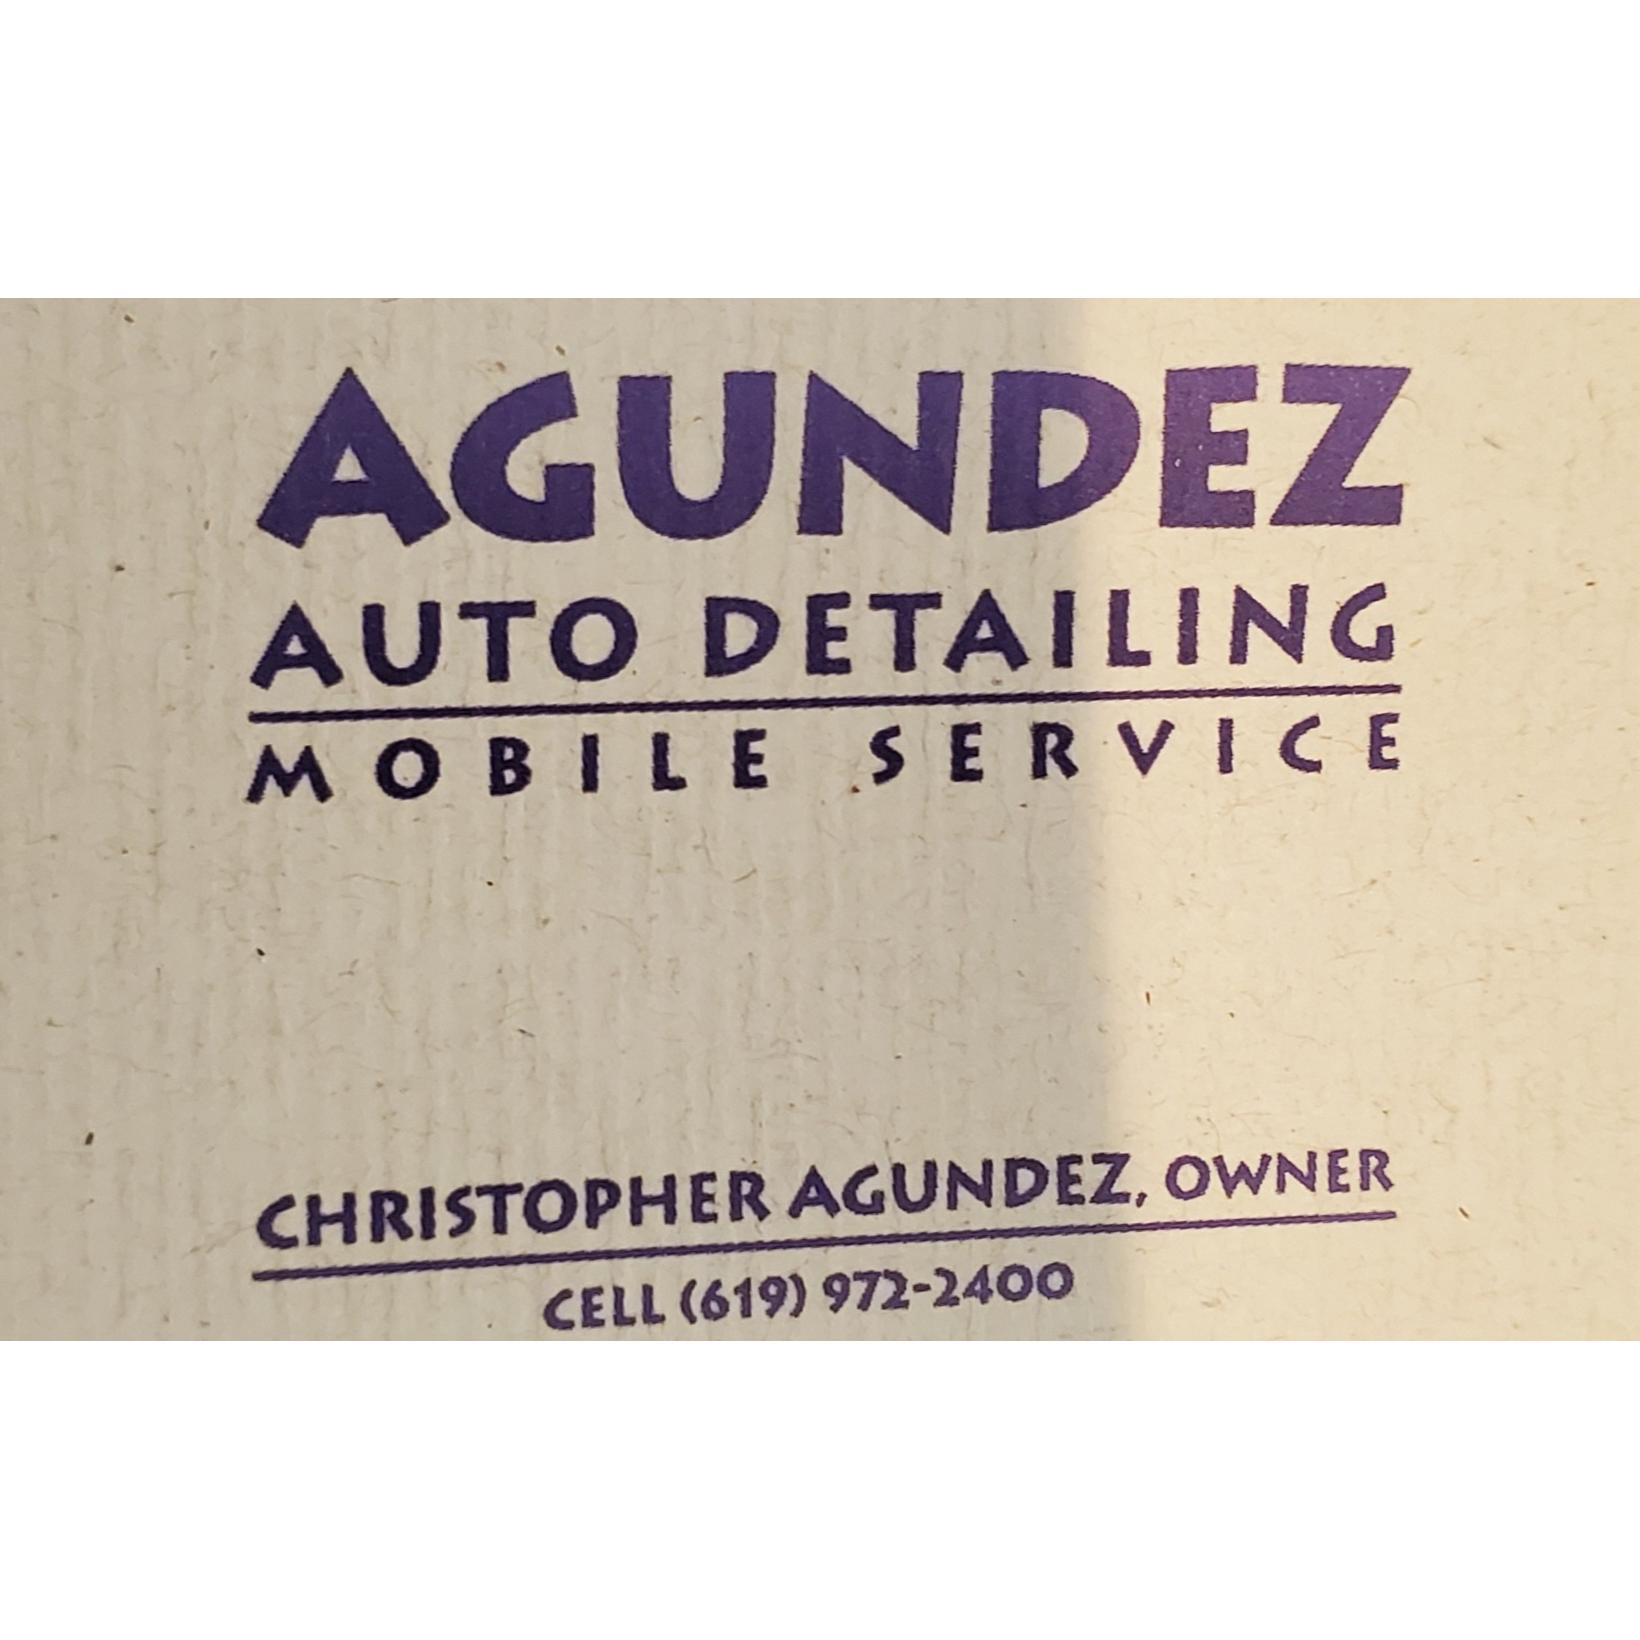 Agundez Auto Detailing